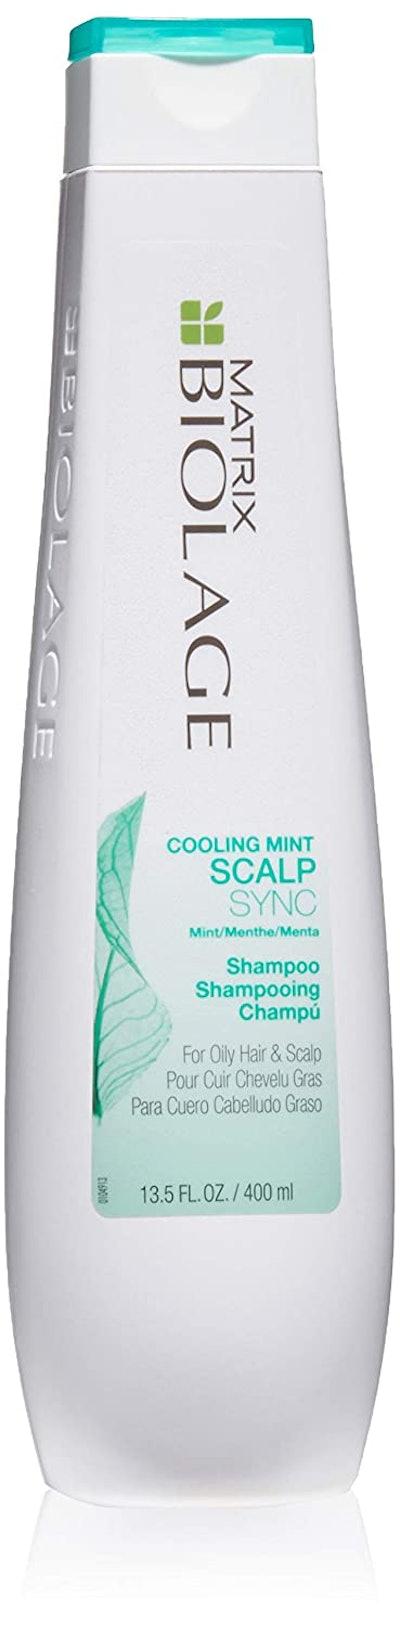 Matrix Biolage Scalpsync Cooling Mint Shampoo (13.5 Fluid Ounces)